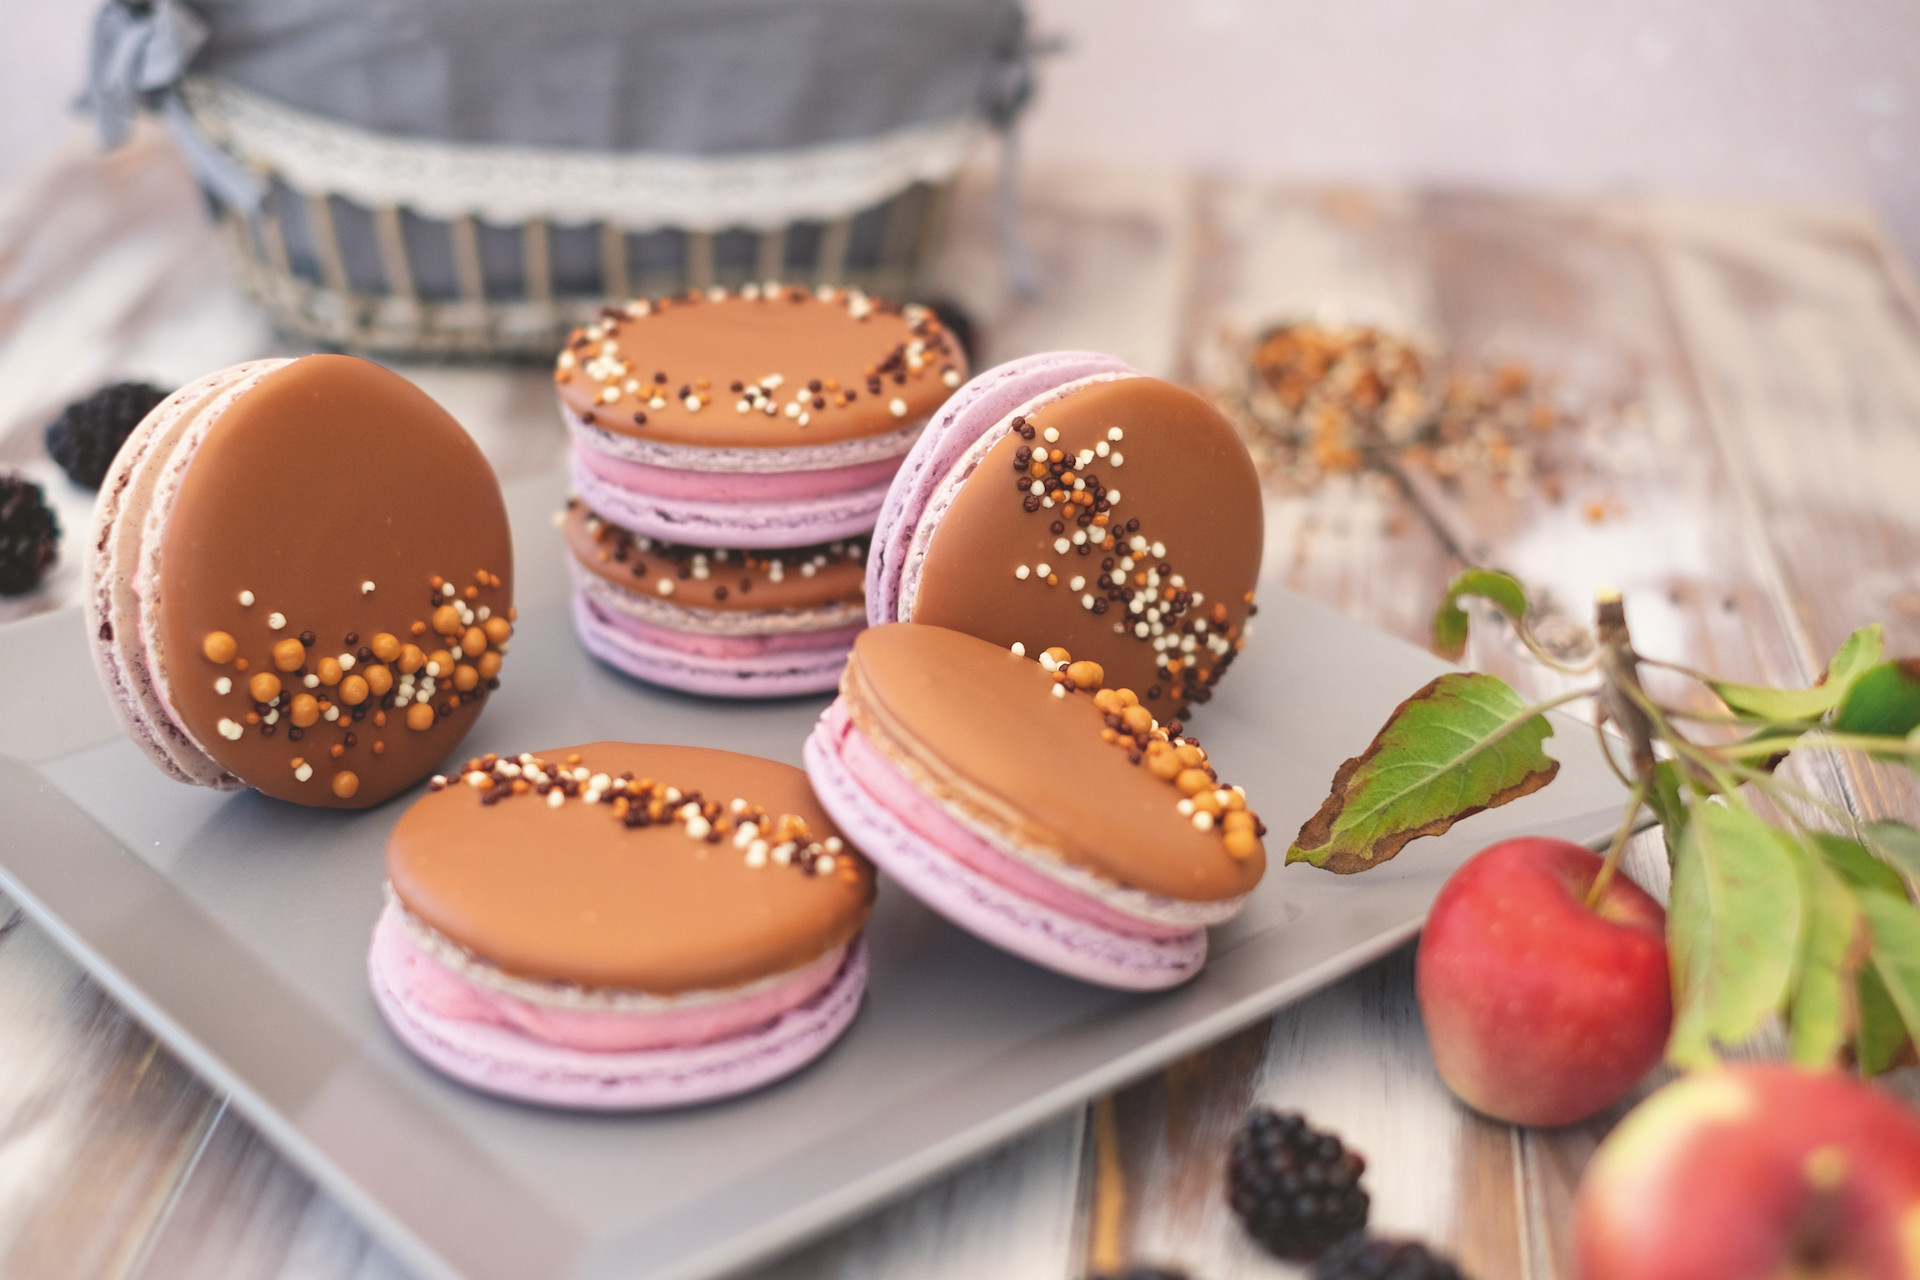 Brombeer-Apfel-Macarons mit Buttercreme-Füllung